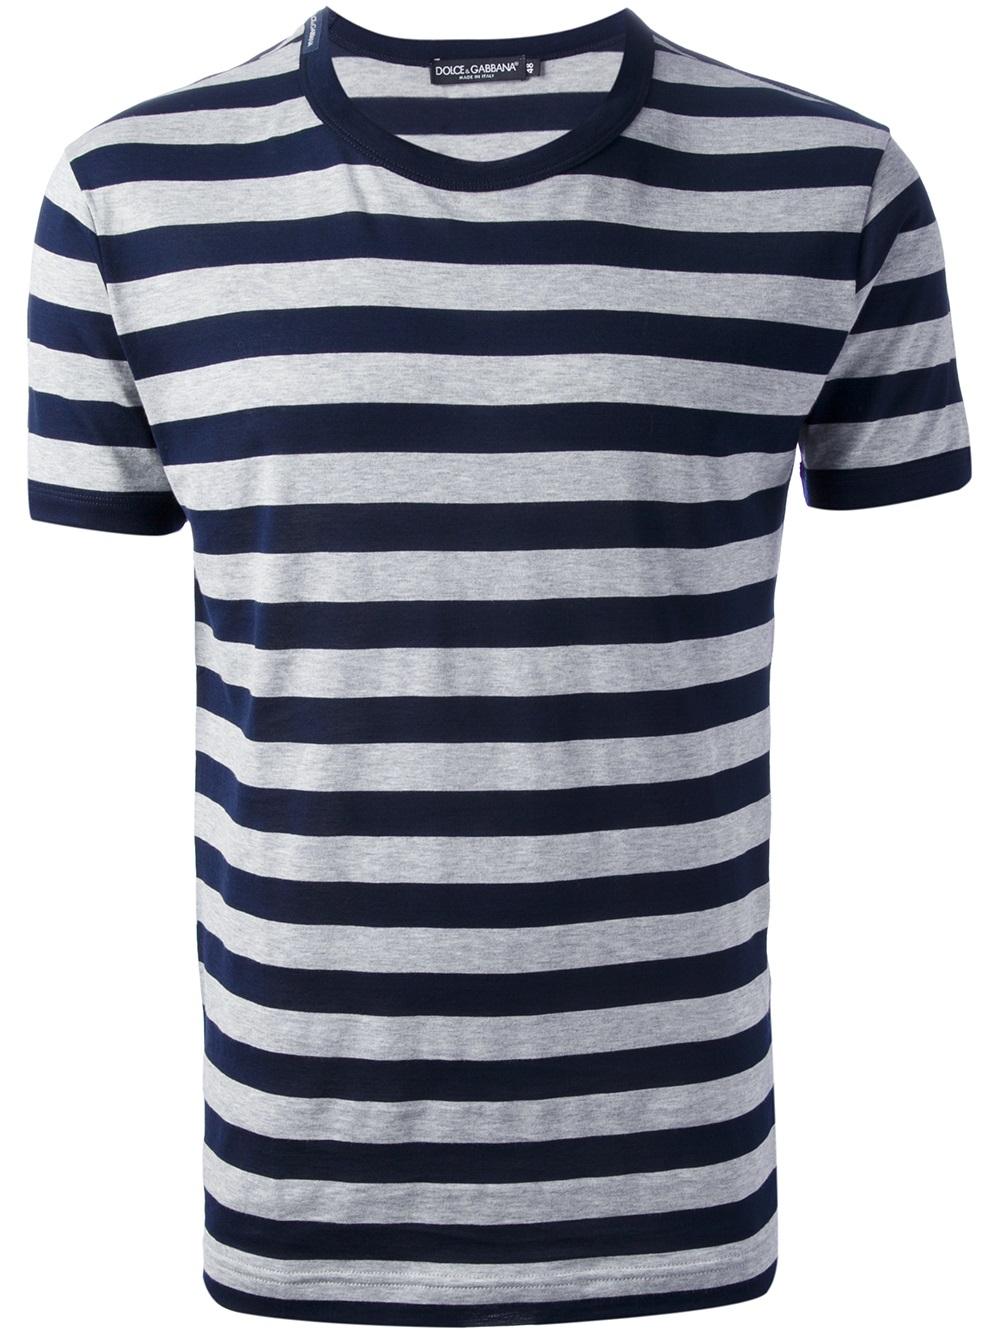 d28727c4 Dolce & Gabbana Striped Tshirt in Blue for Men - Lyst